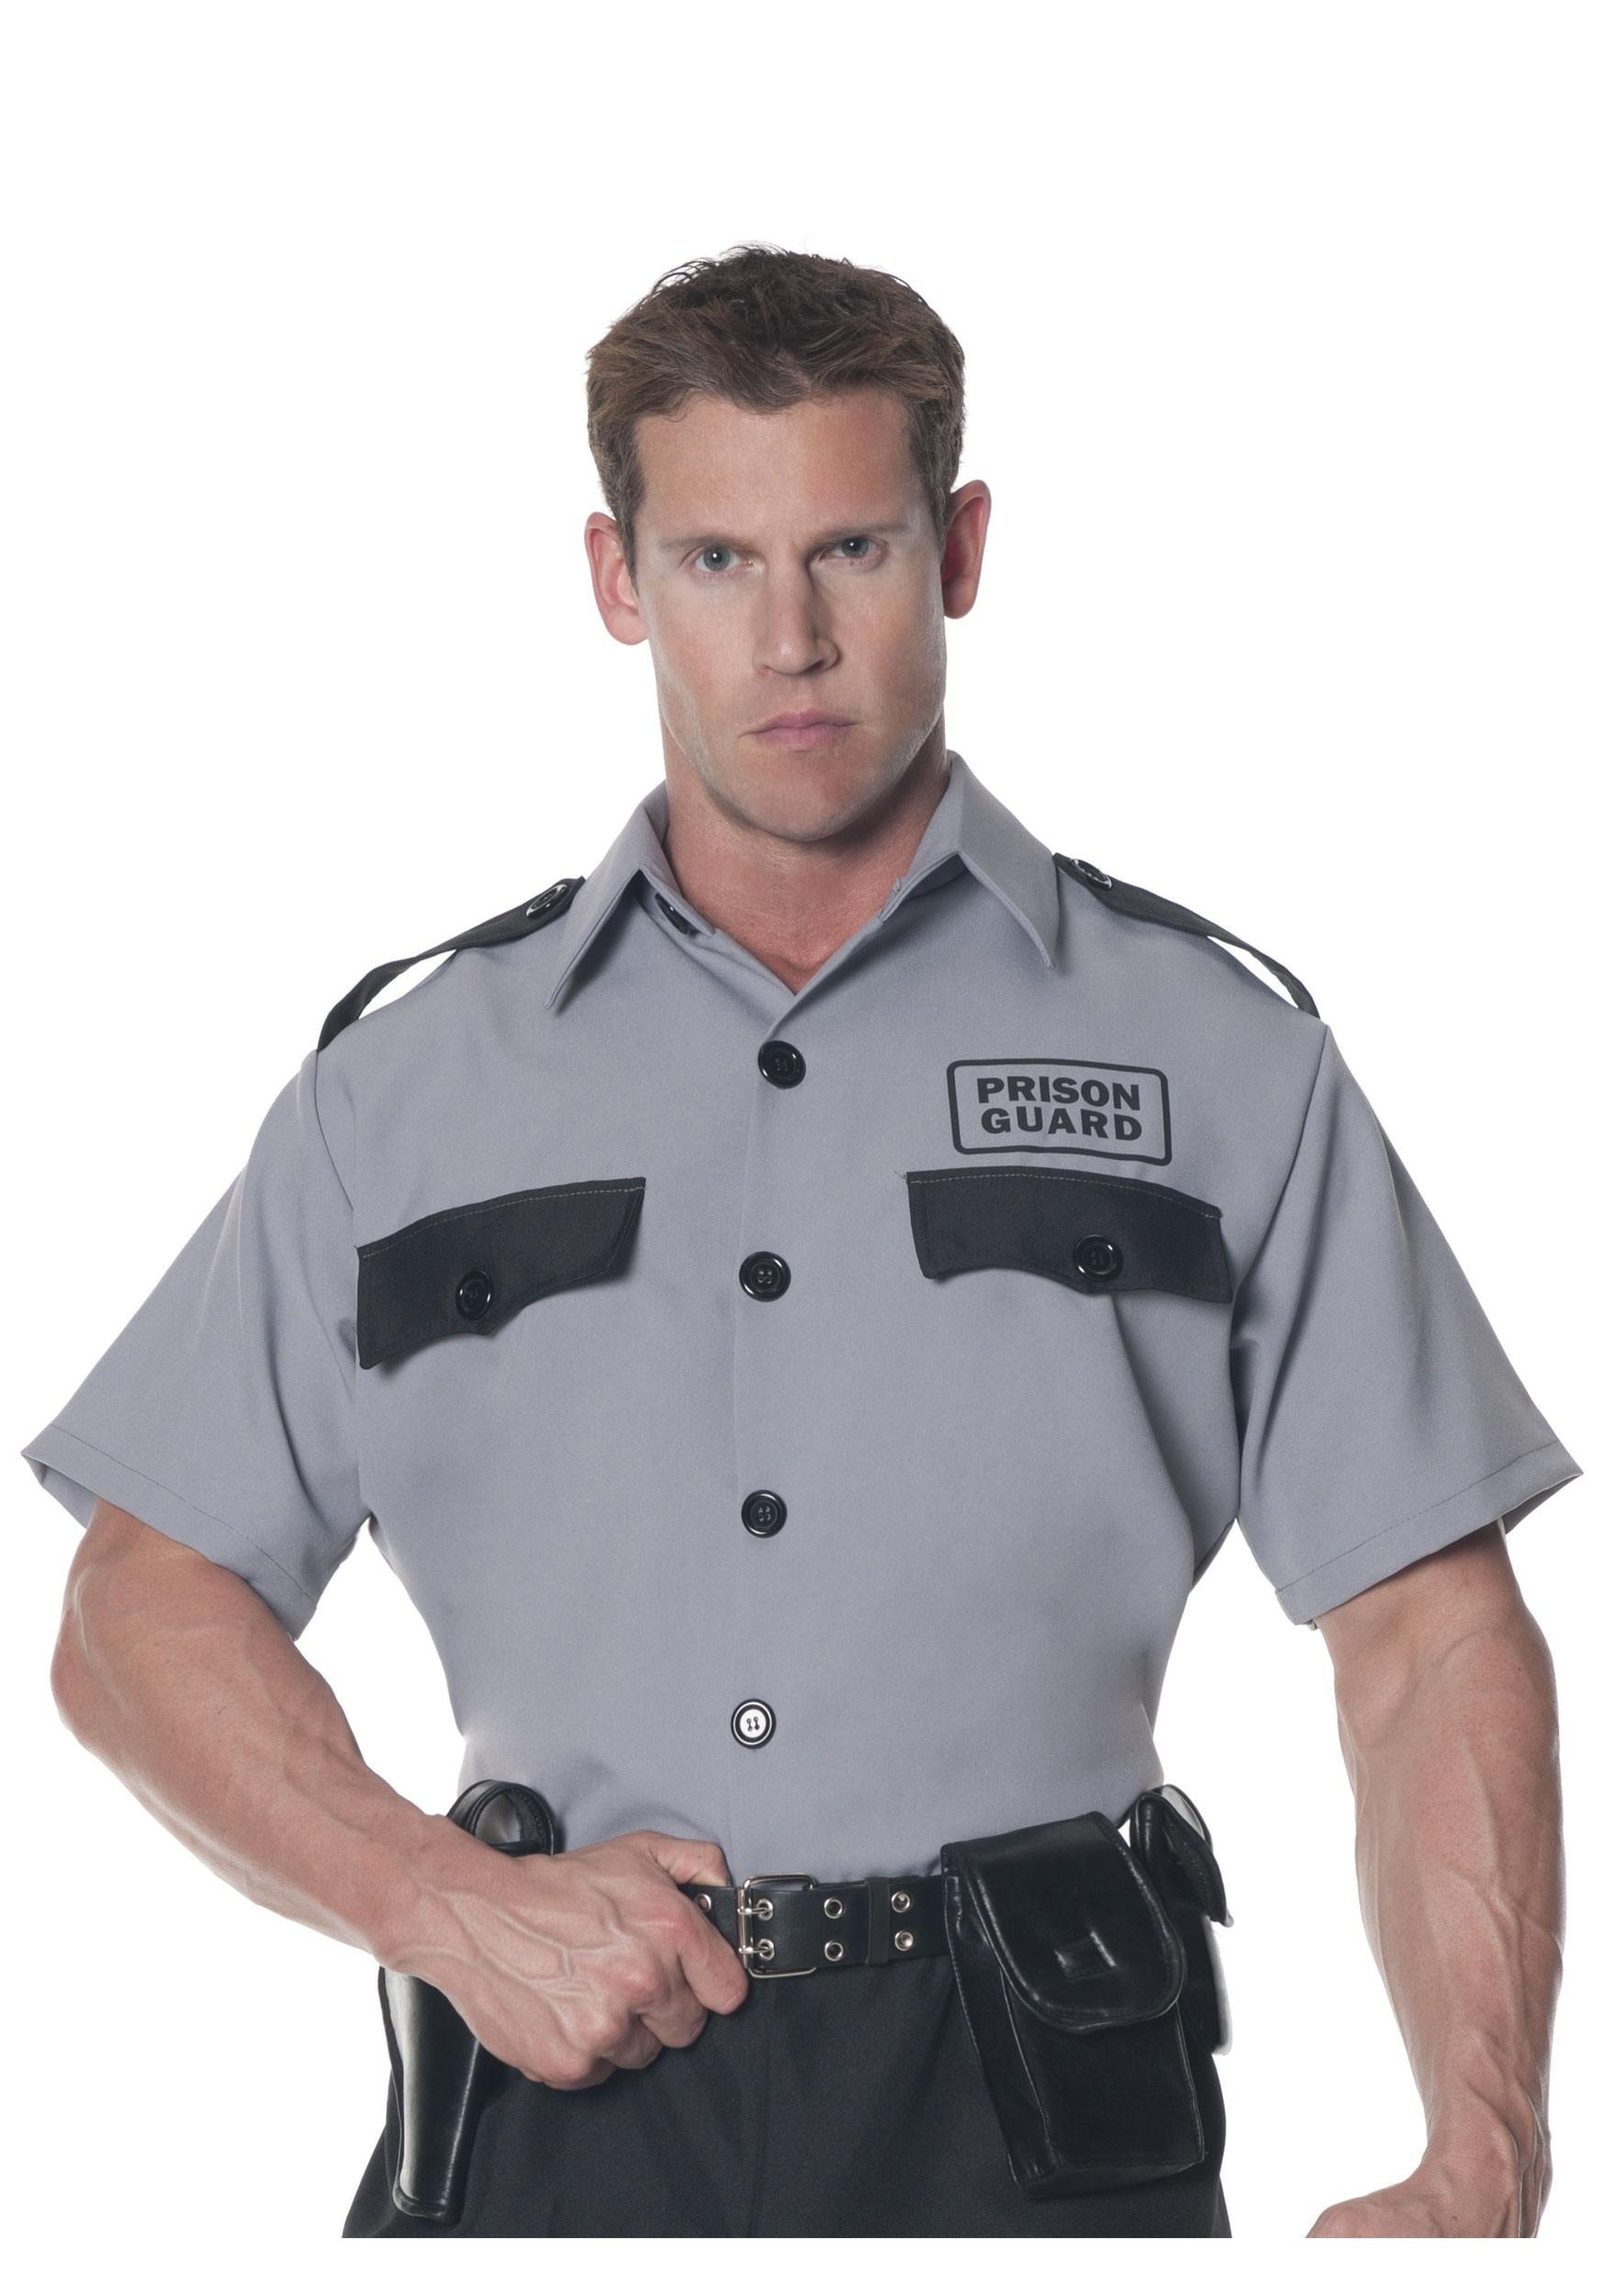 Security Guard Baton